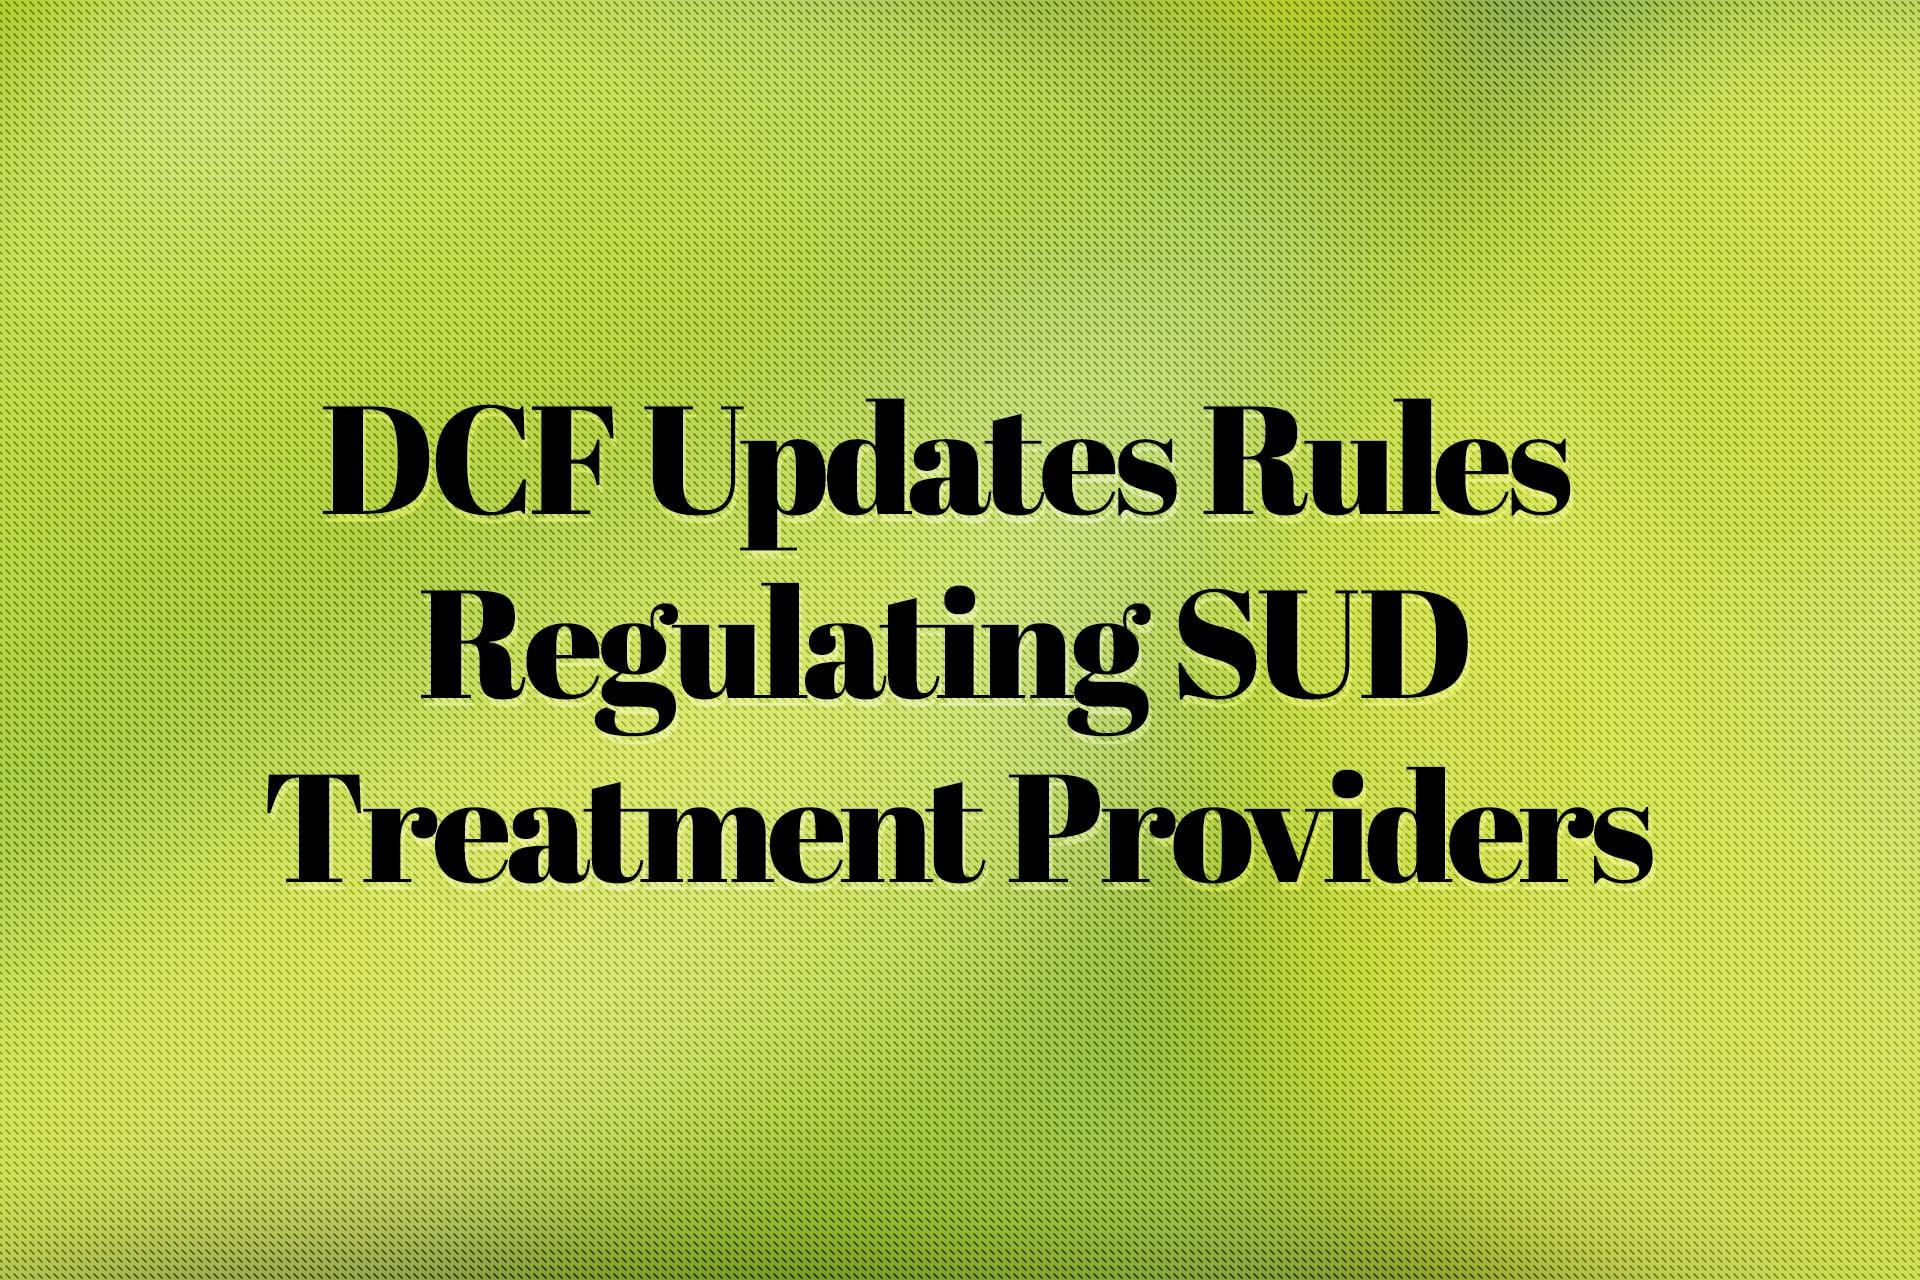 DCF Updates Rules Regulating SUD Treatment Providers